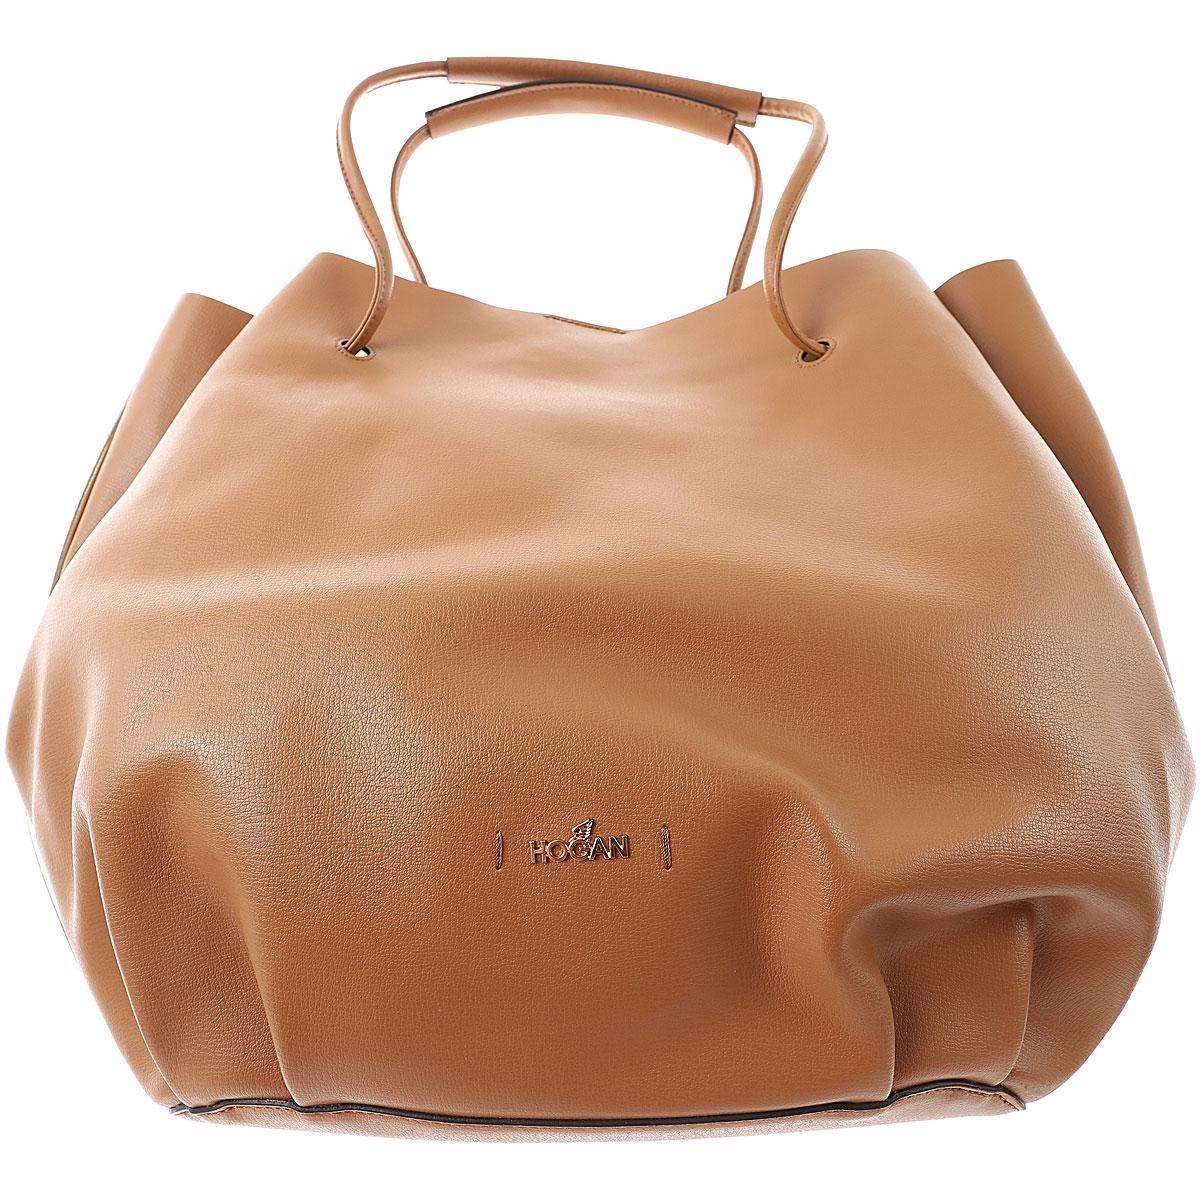 42eb3448d0 Lyst - Hogan Handbags in Brown